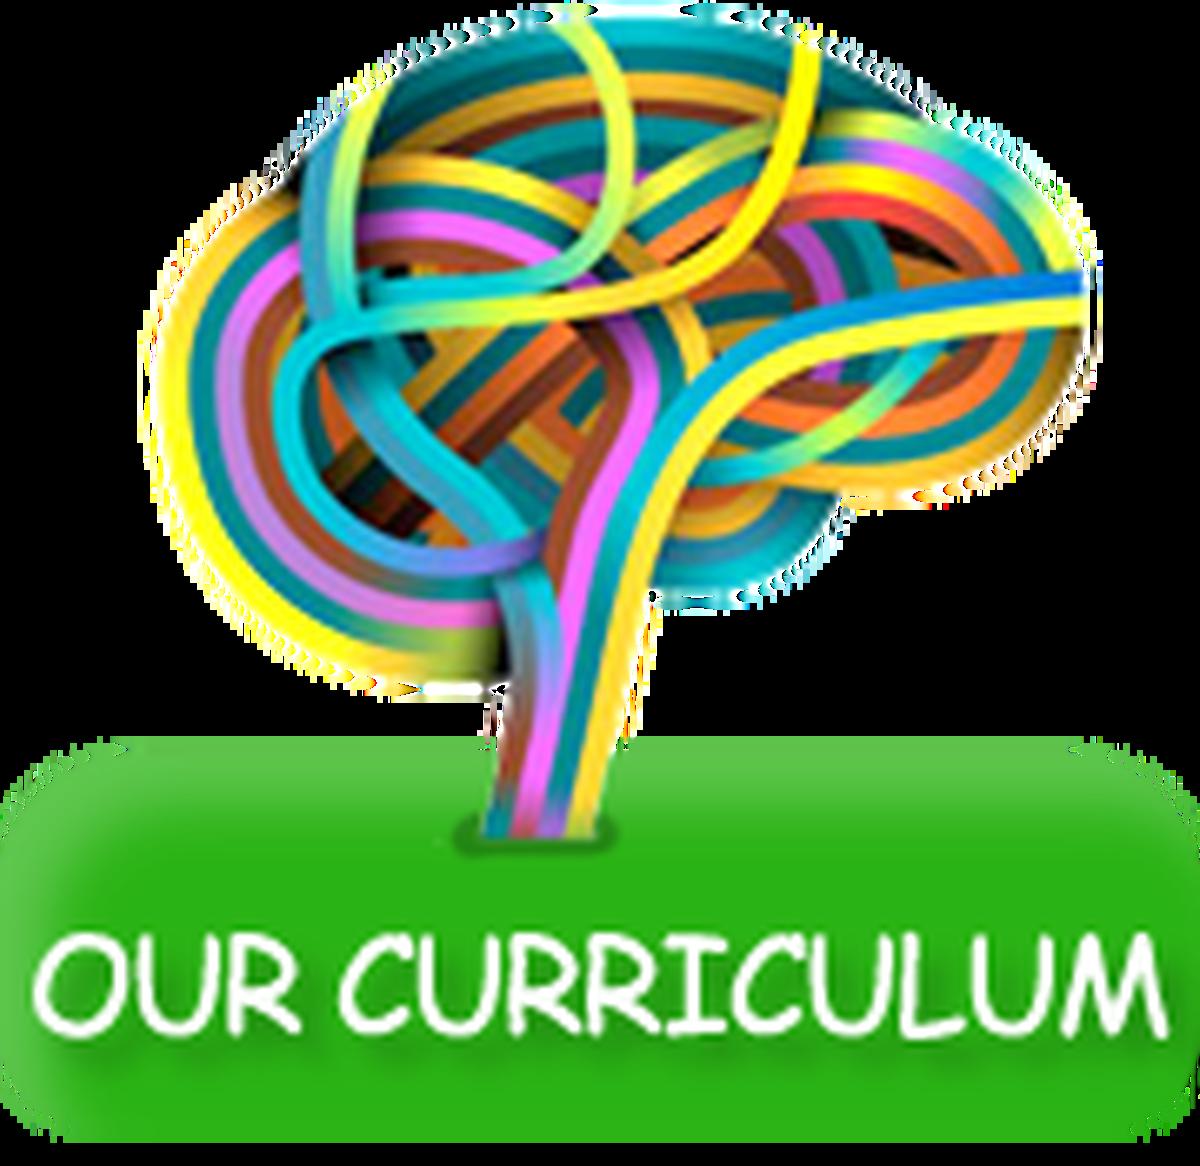 Curriculum clipart curriculum development. Ikids preschool